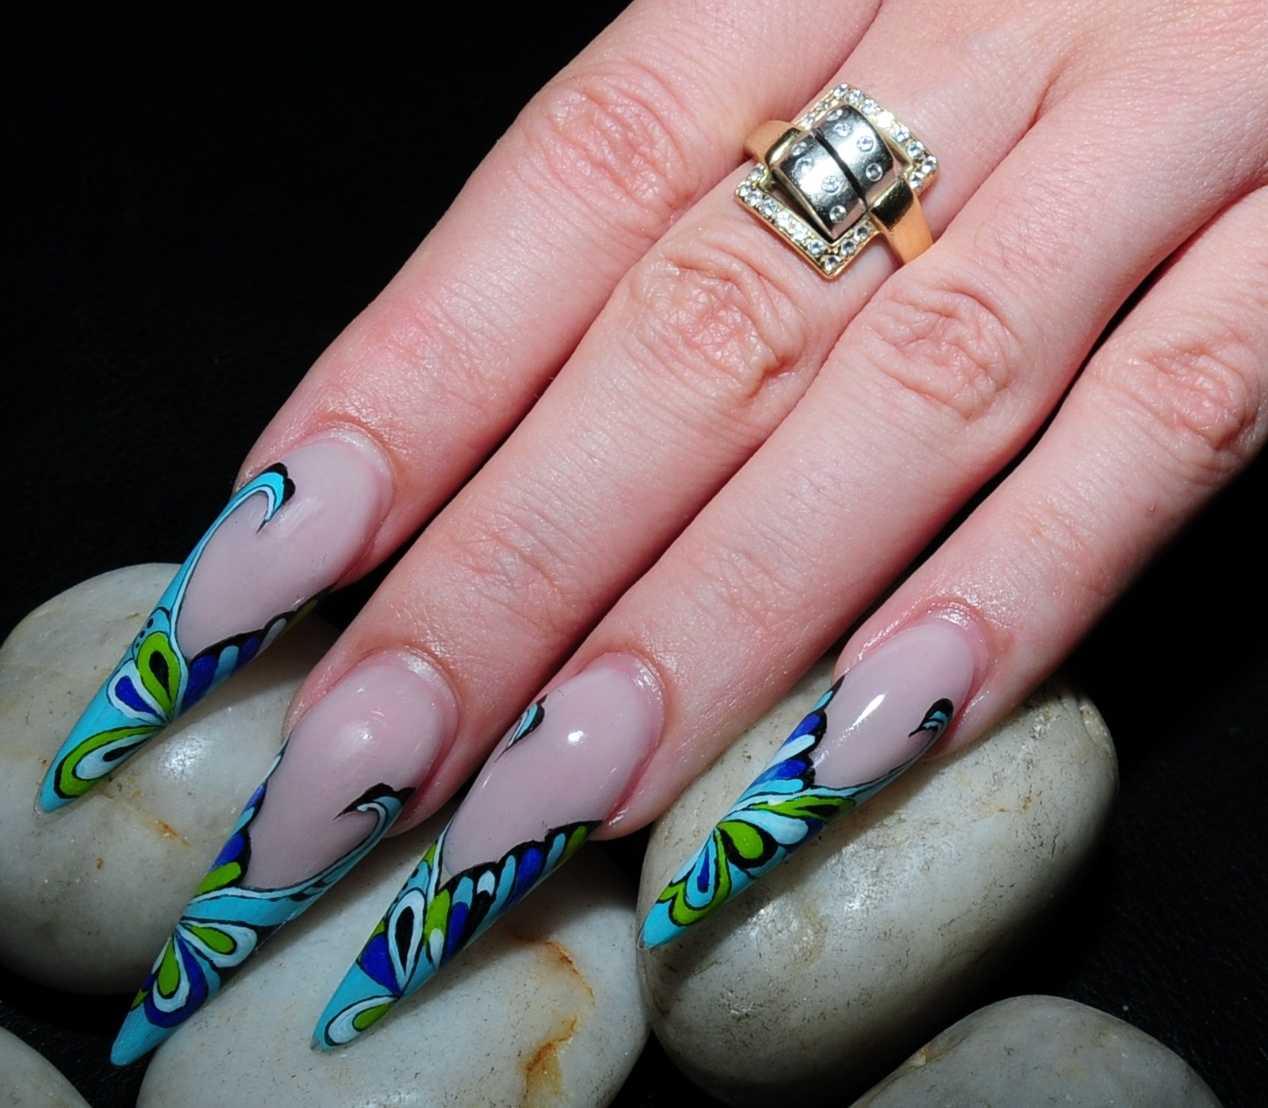 Crystal Stiletto Nails Designs : 6 Stiletto Nail Designs | Woman ...